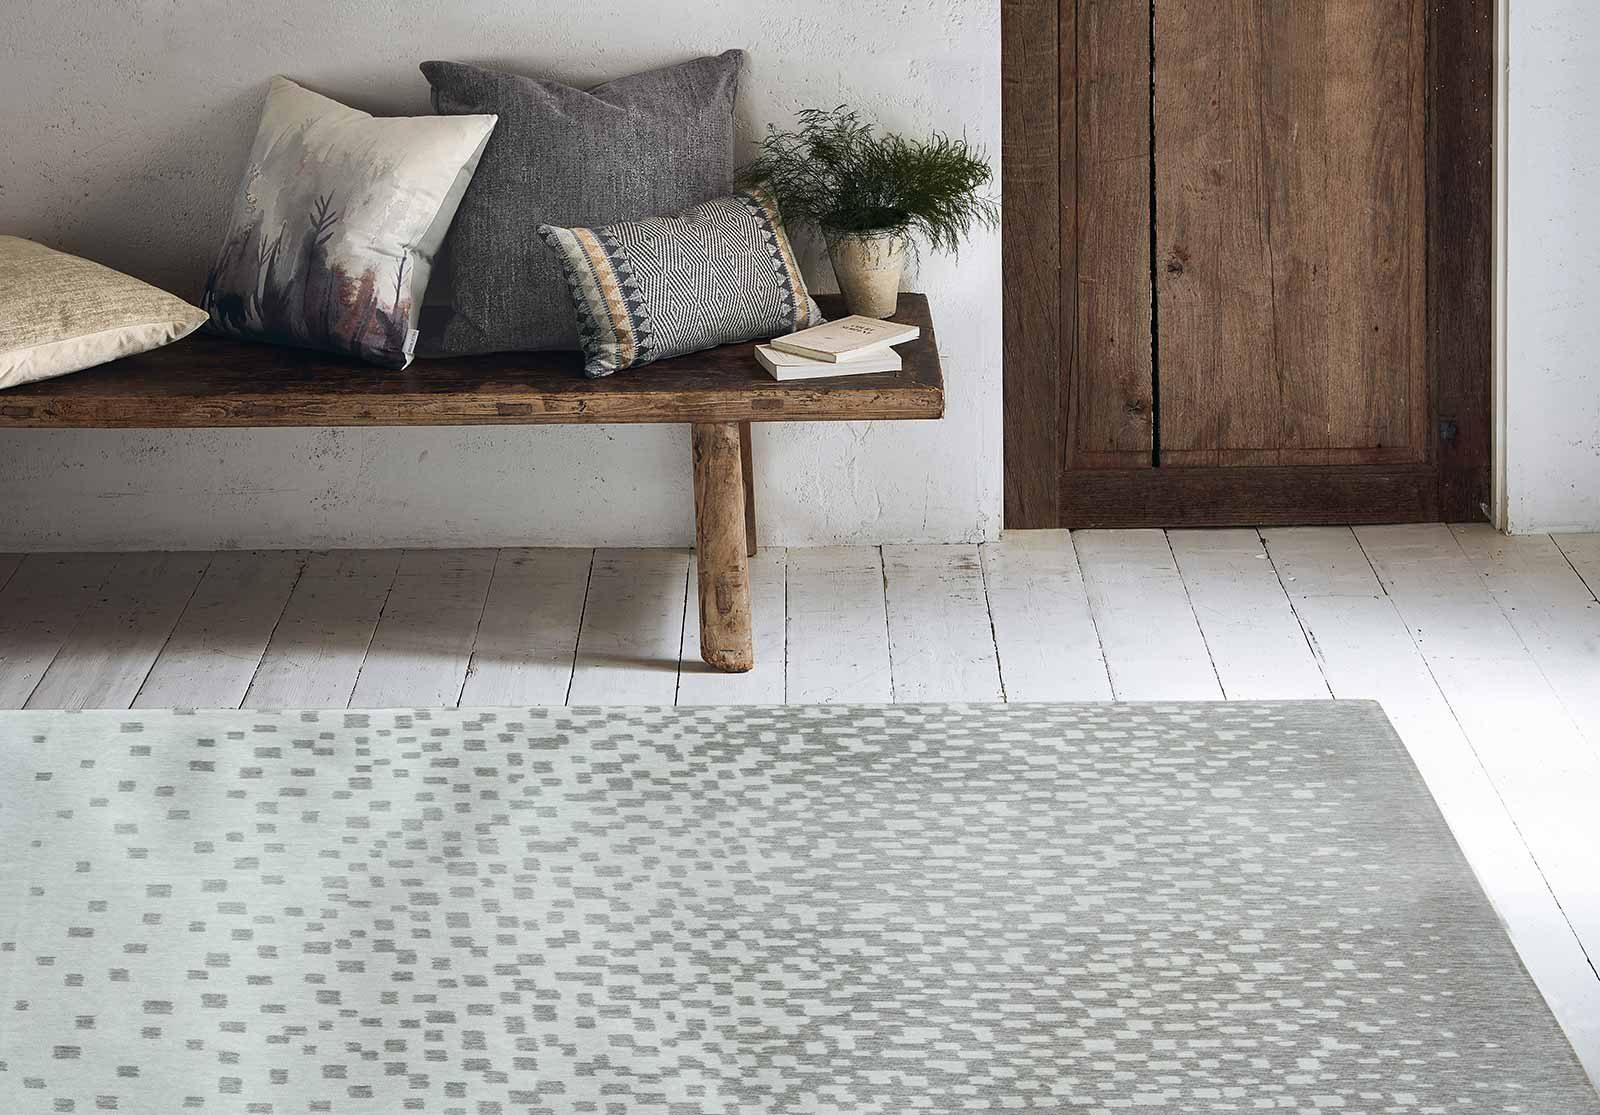 Louis De Poortere alfombras Villa Nova LX 8778 Freyr Verdigris interior